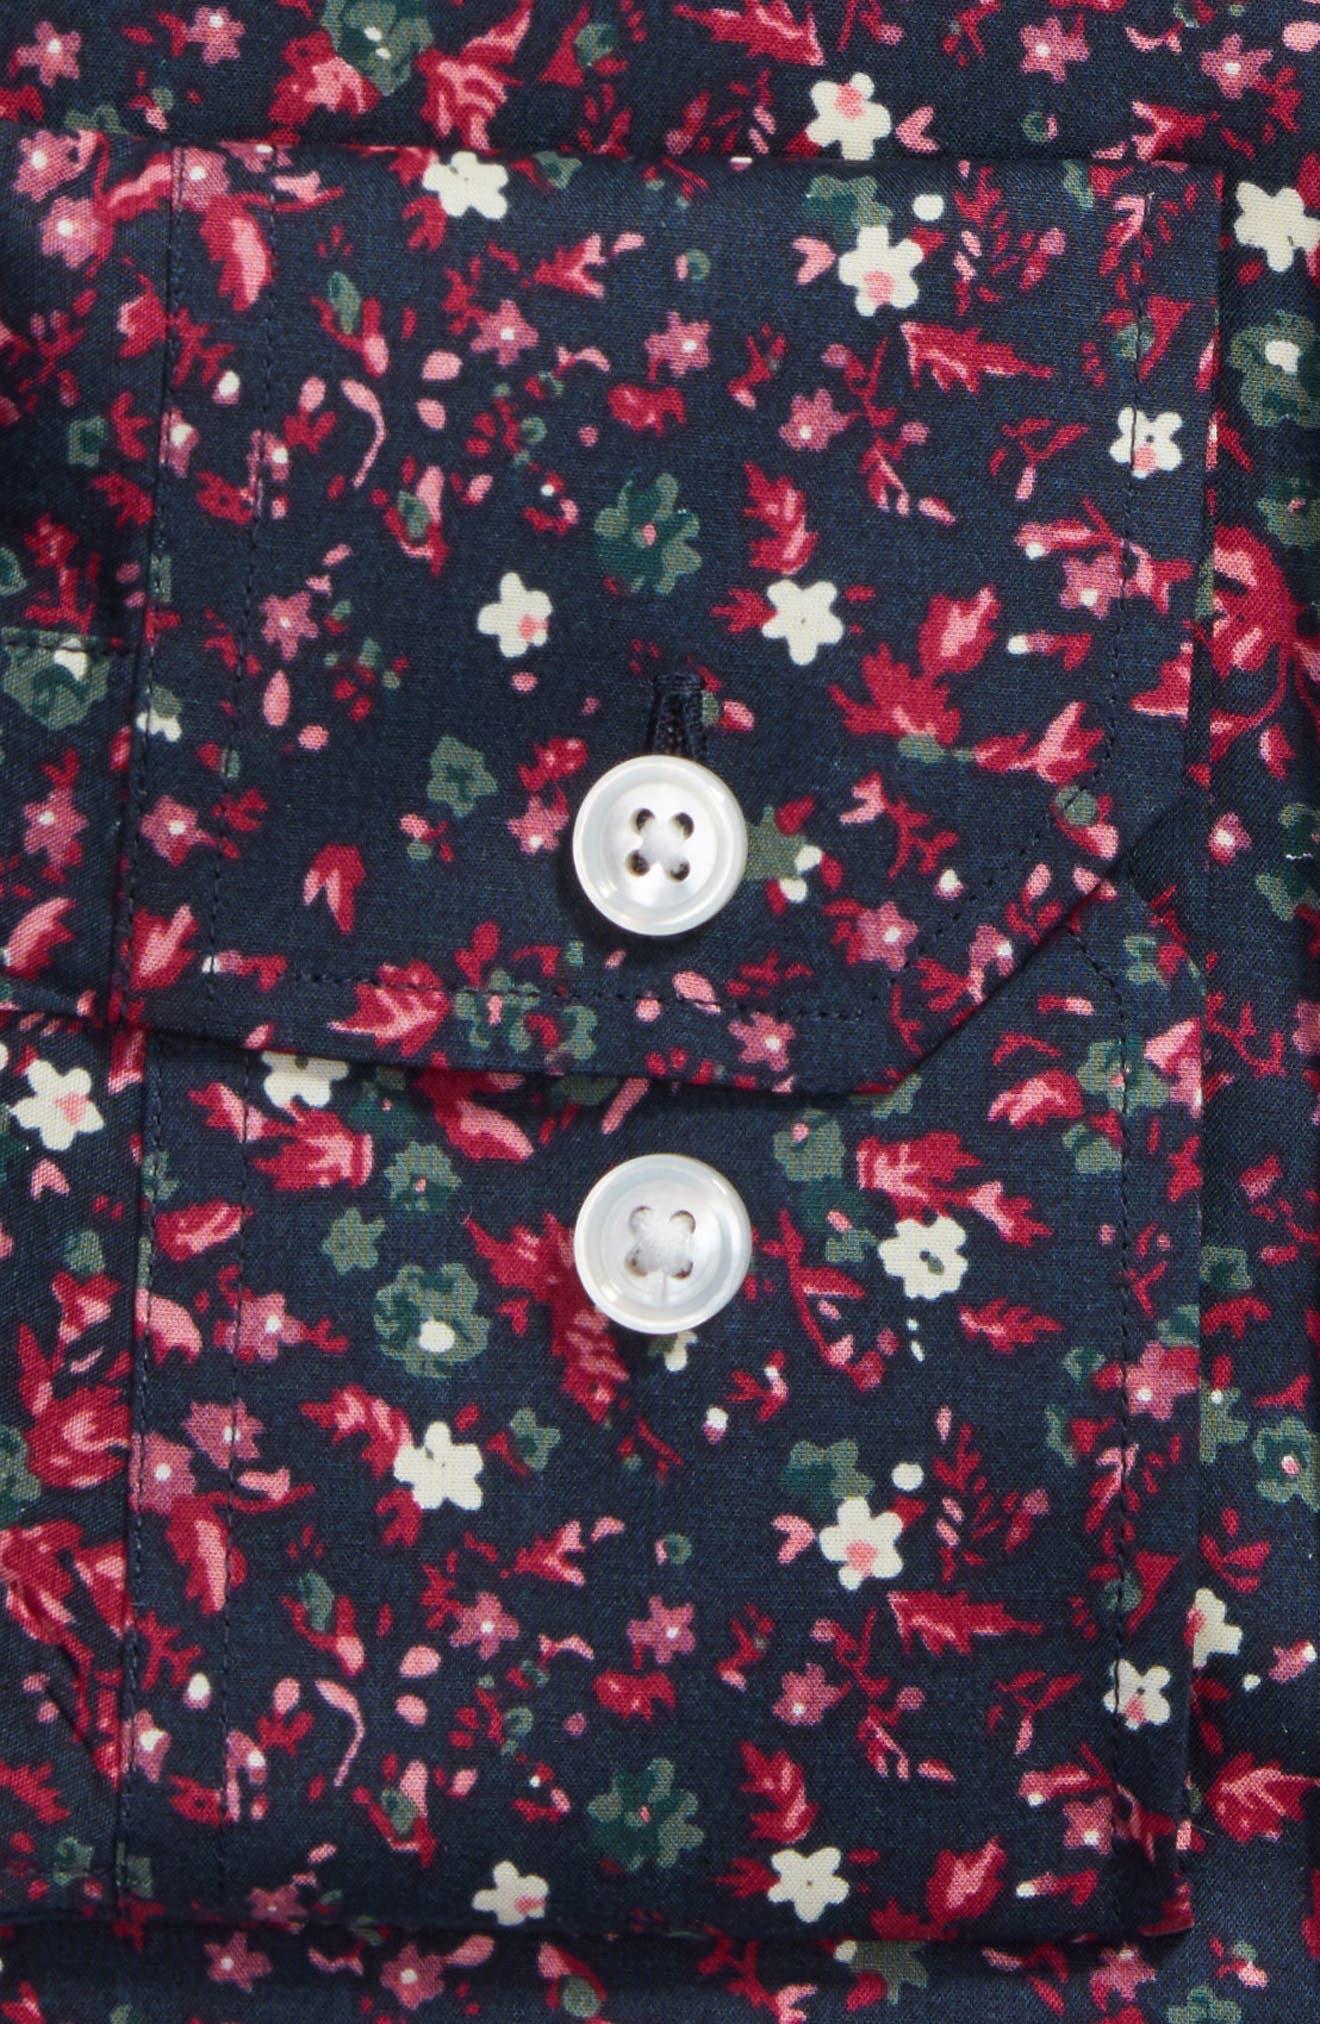 Mali Slim Fit Stretch Floral Dress Shirt,                             Alternate thumbnail 2, color,                             Black Raspberry